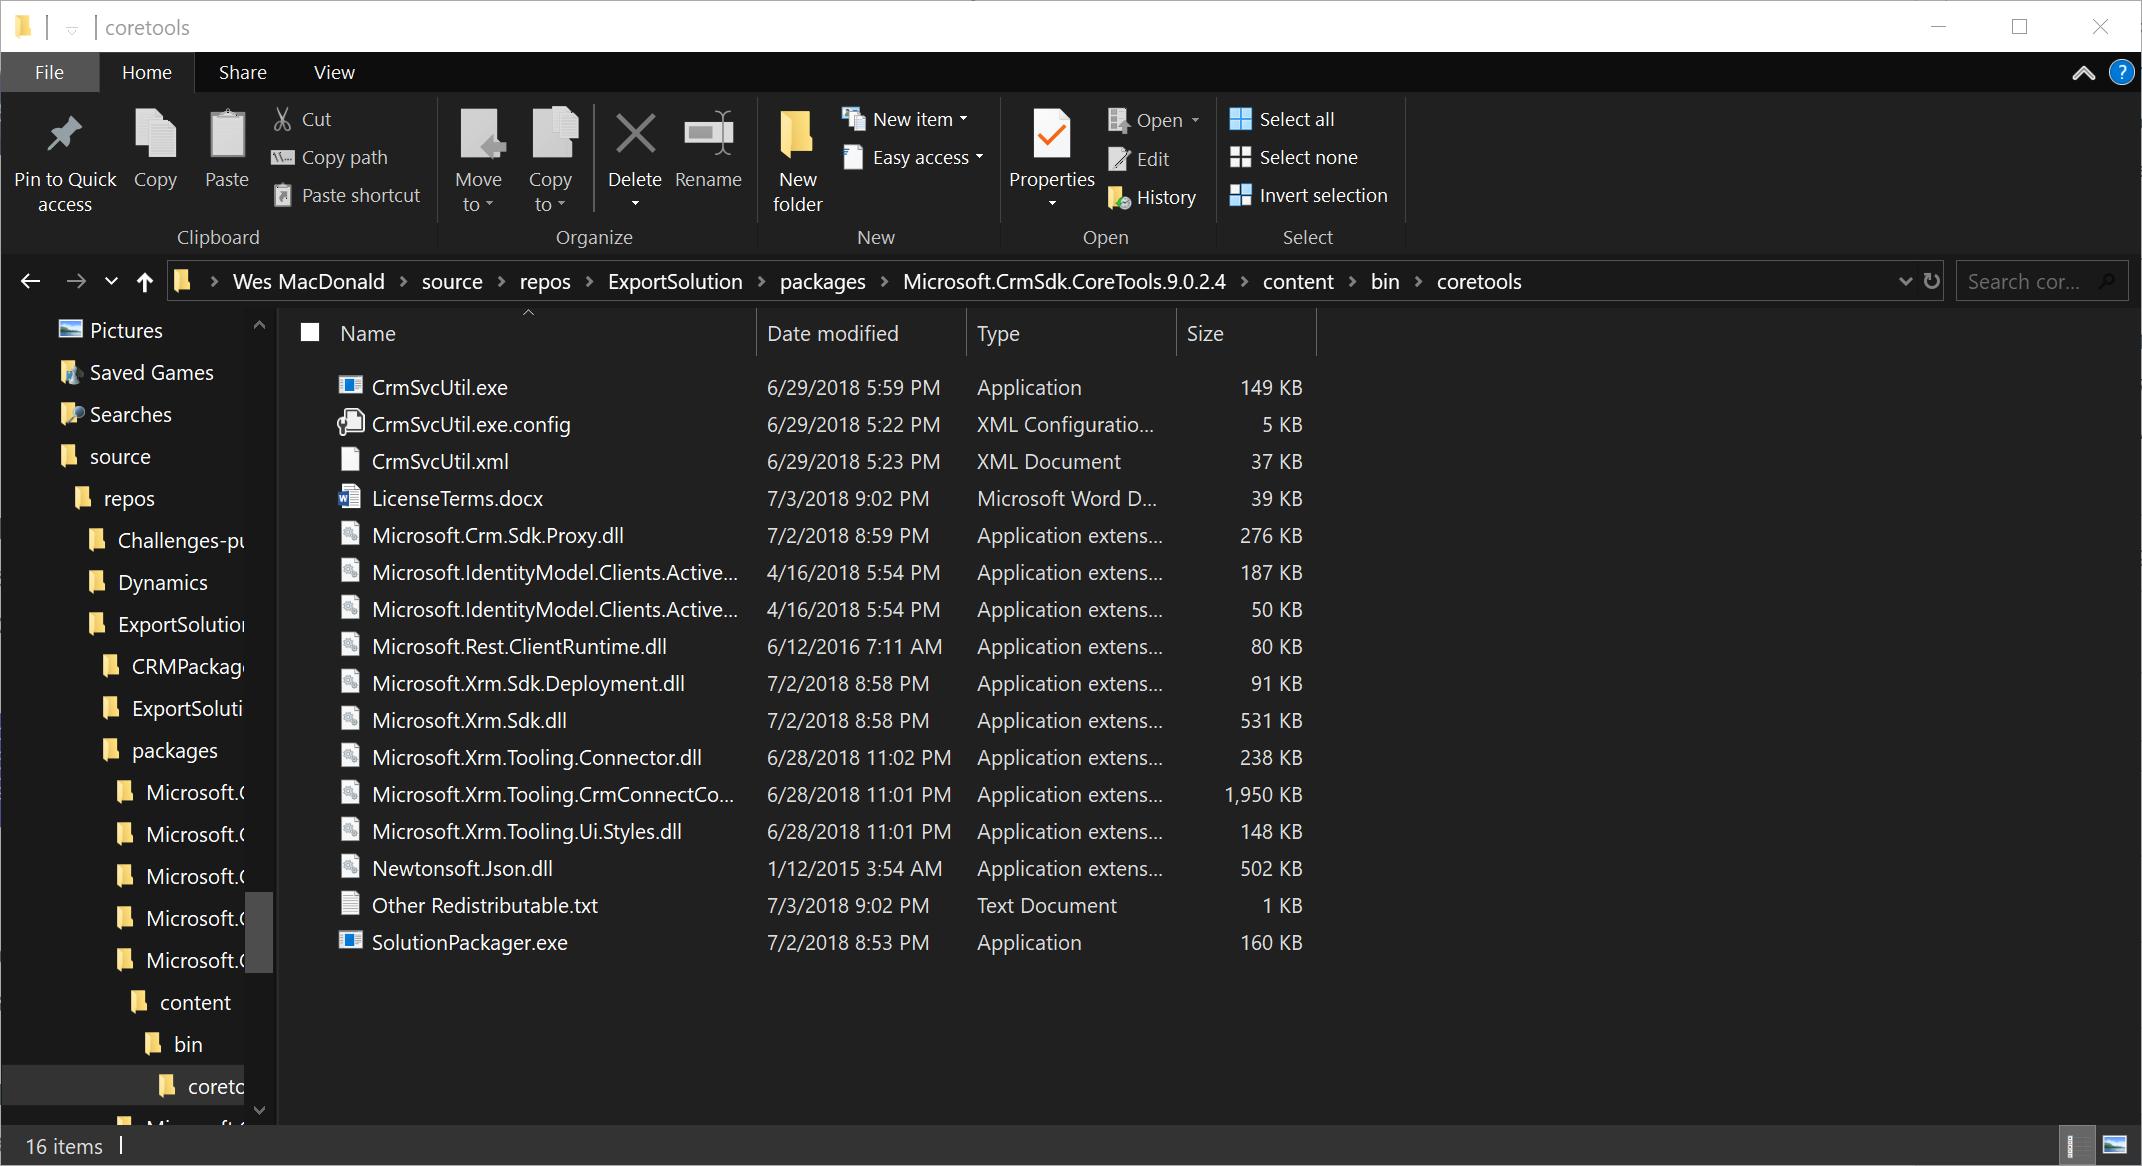 DevOps with Dynamics 365 using VSTS | Azure DevOps and Visual Studio